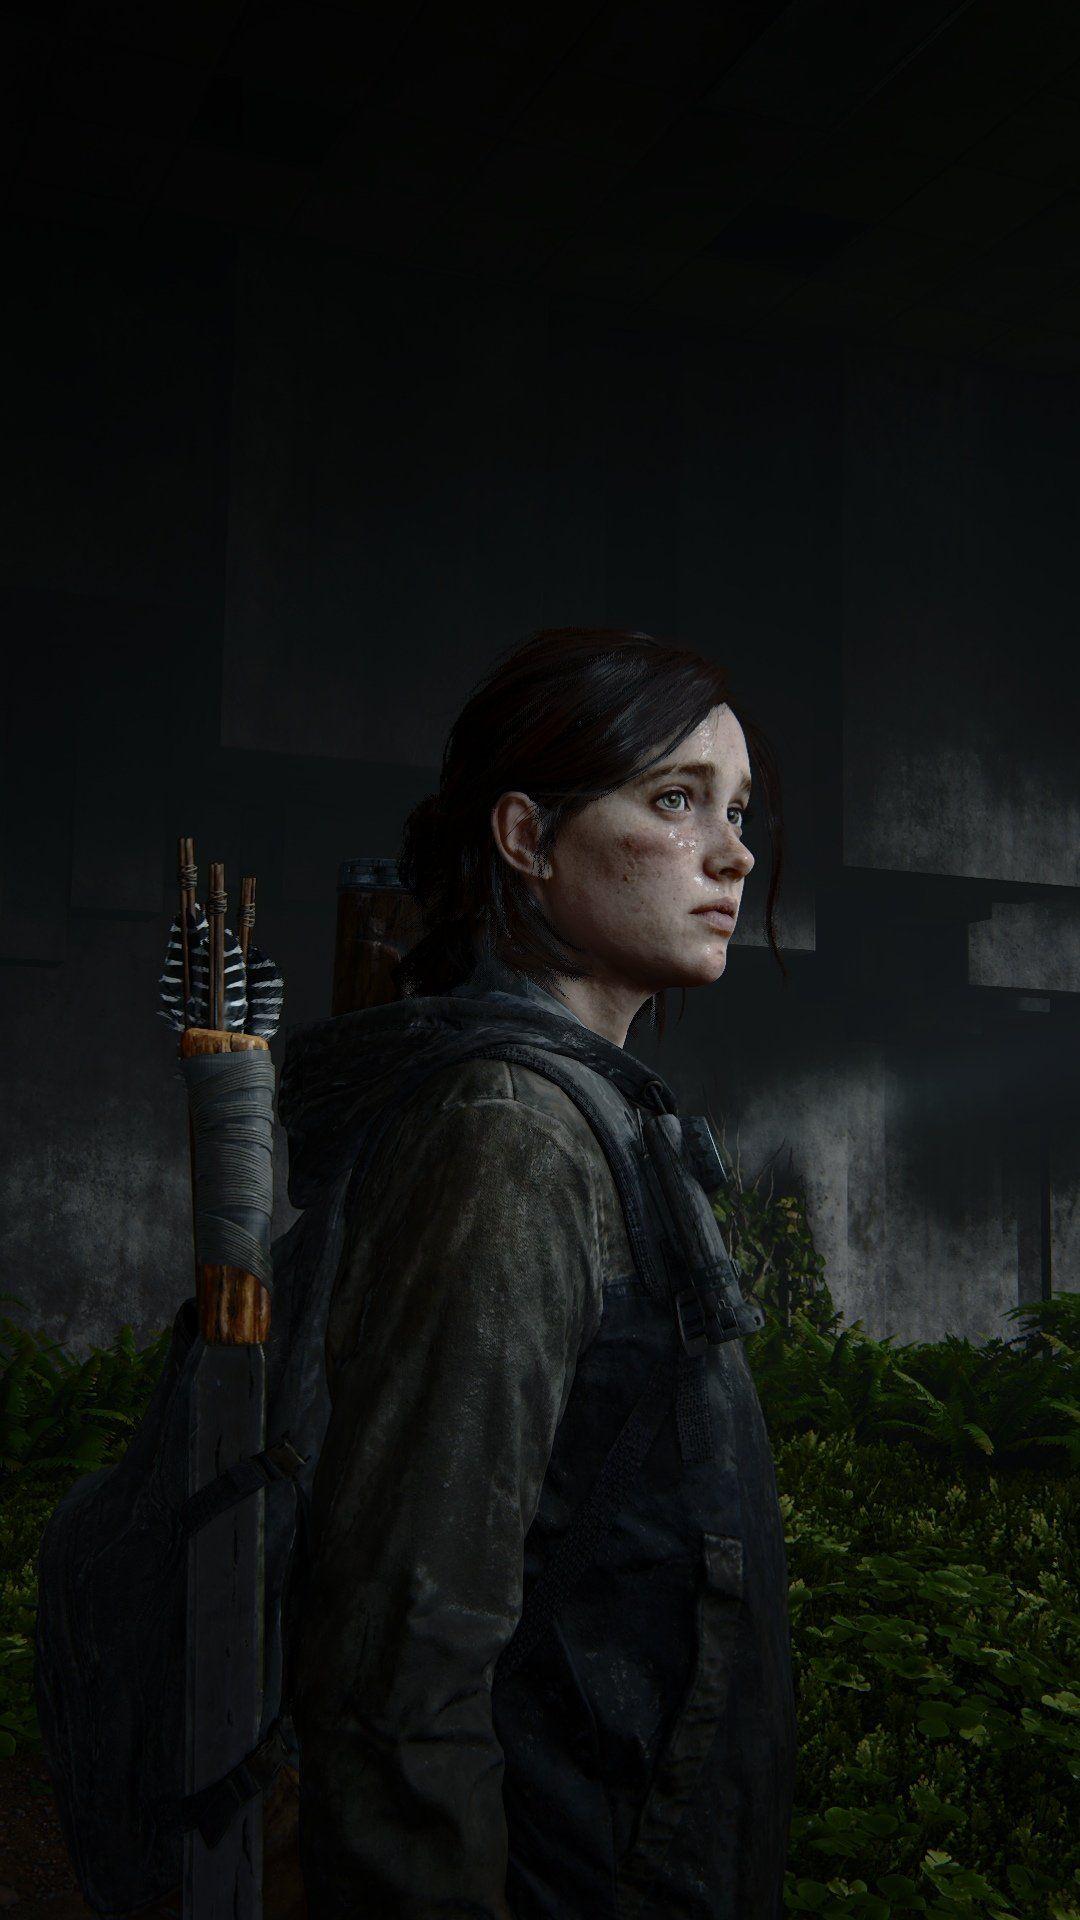 Pin on The Last Of Us I y II